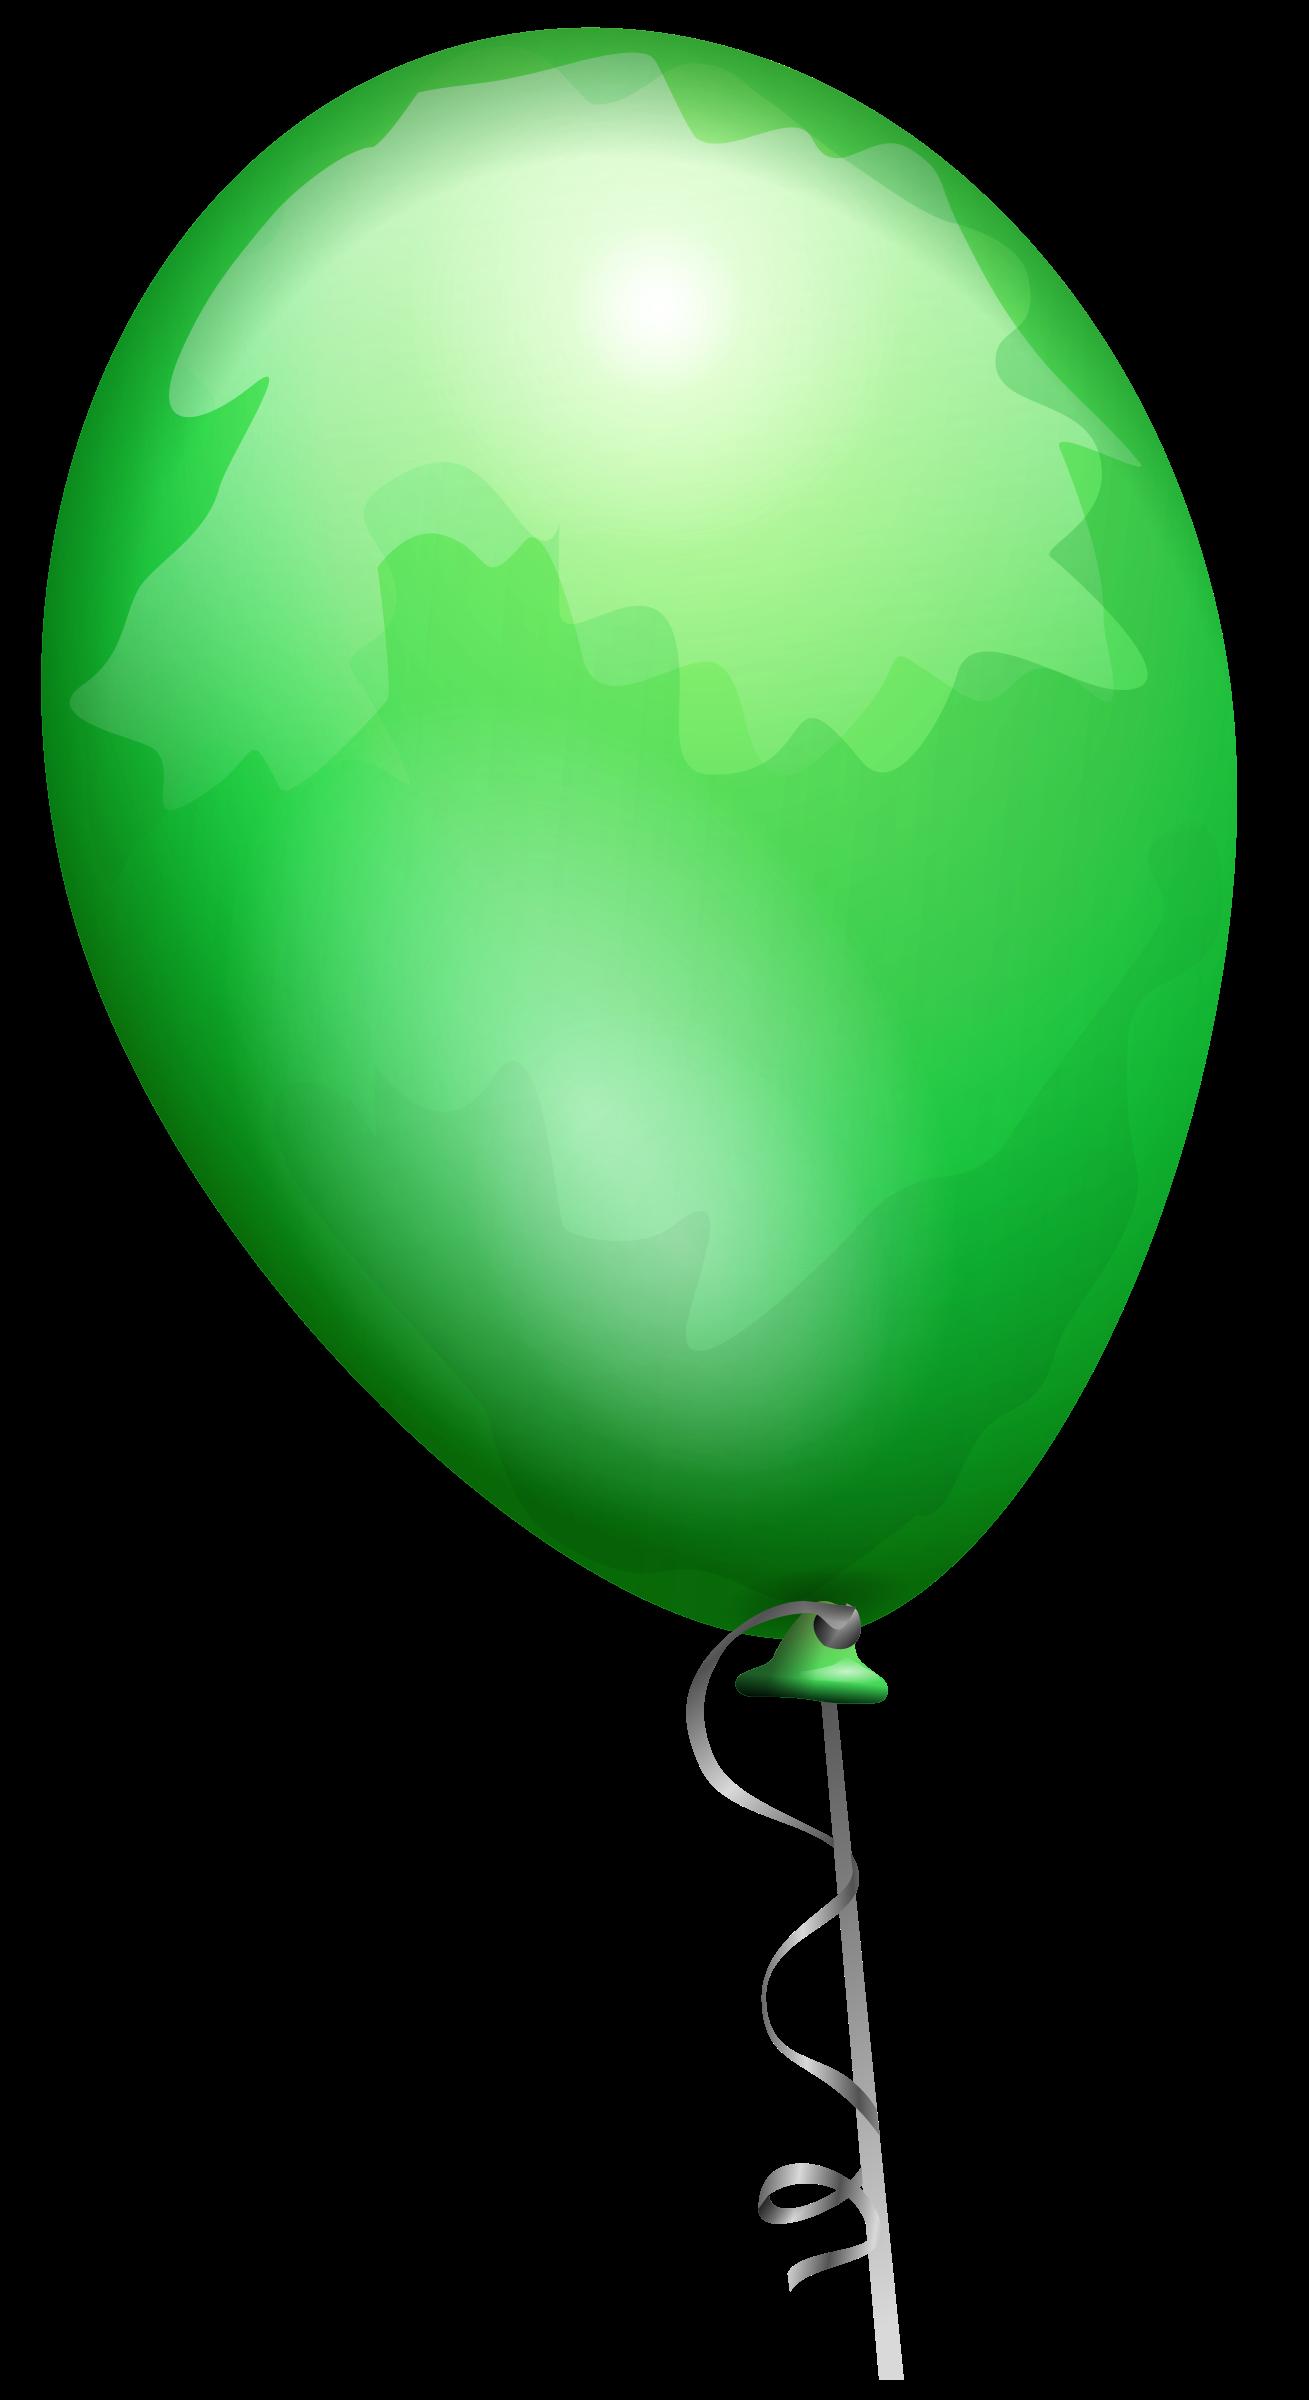 transparent library Clipart green big image. Vector balloon original